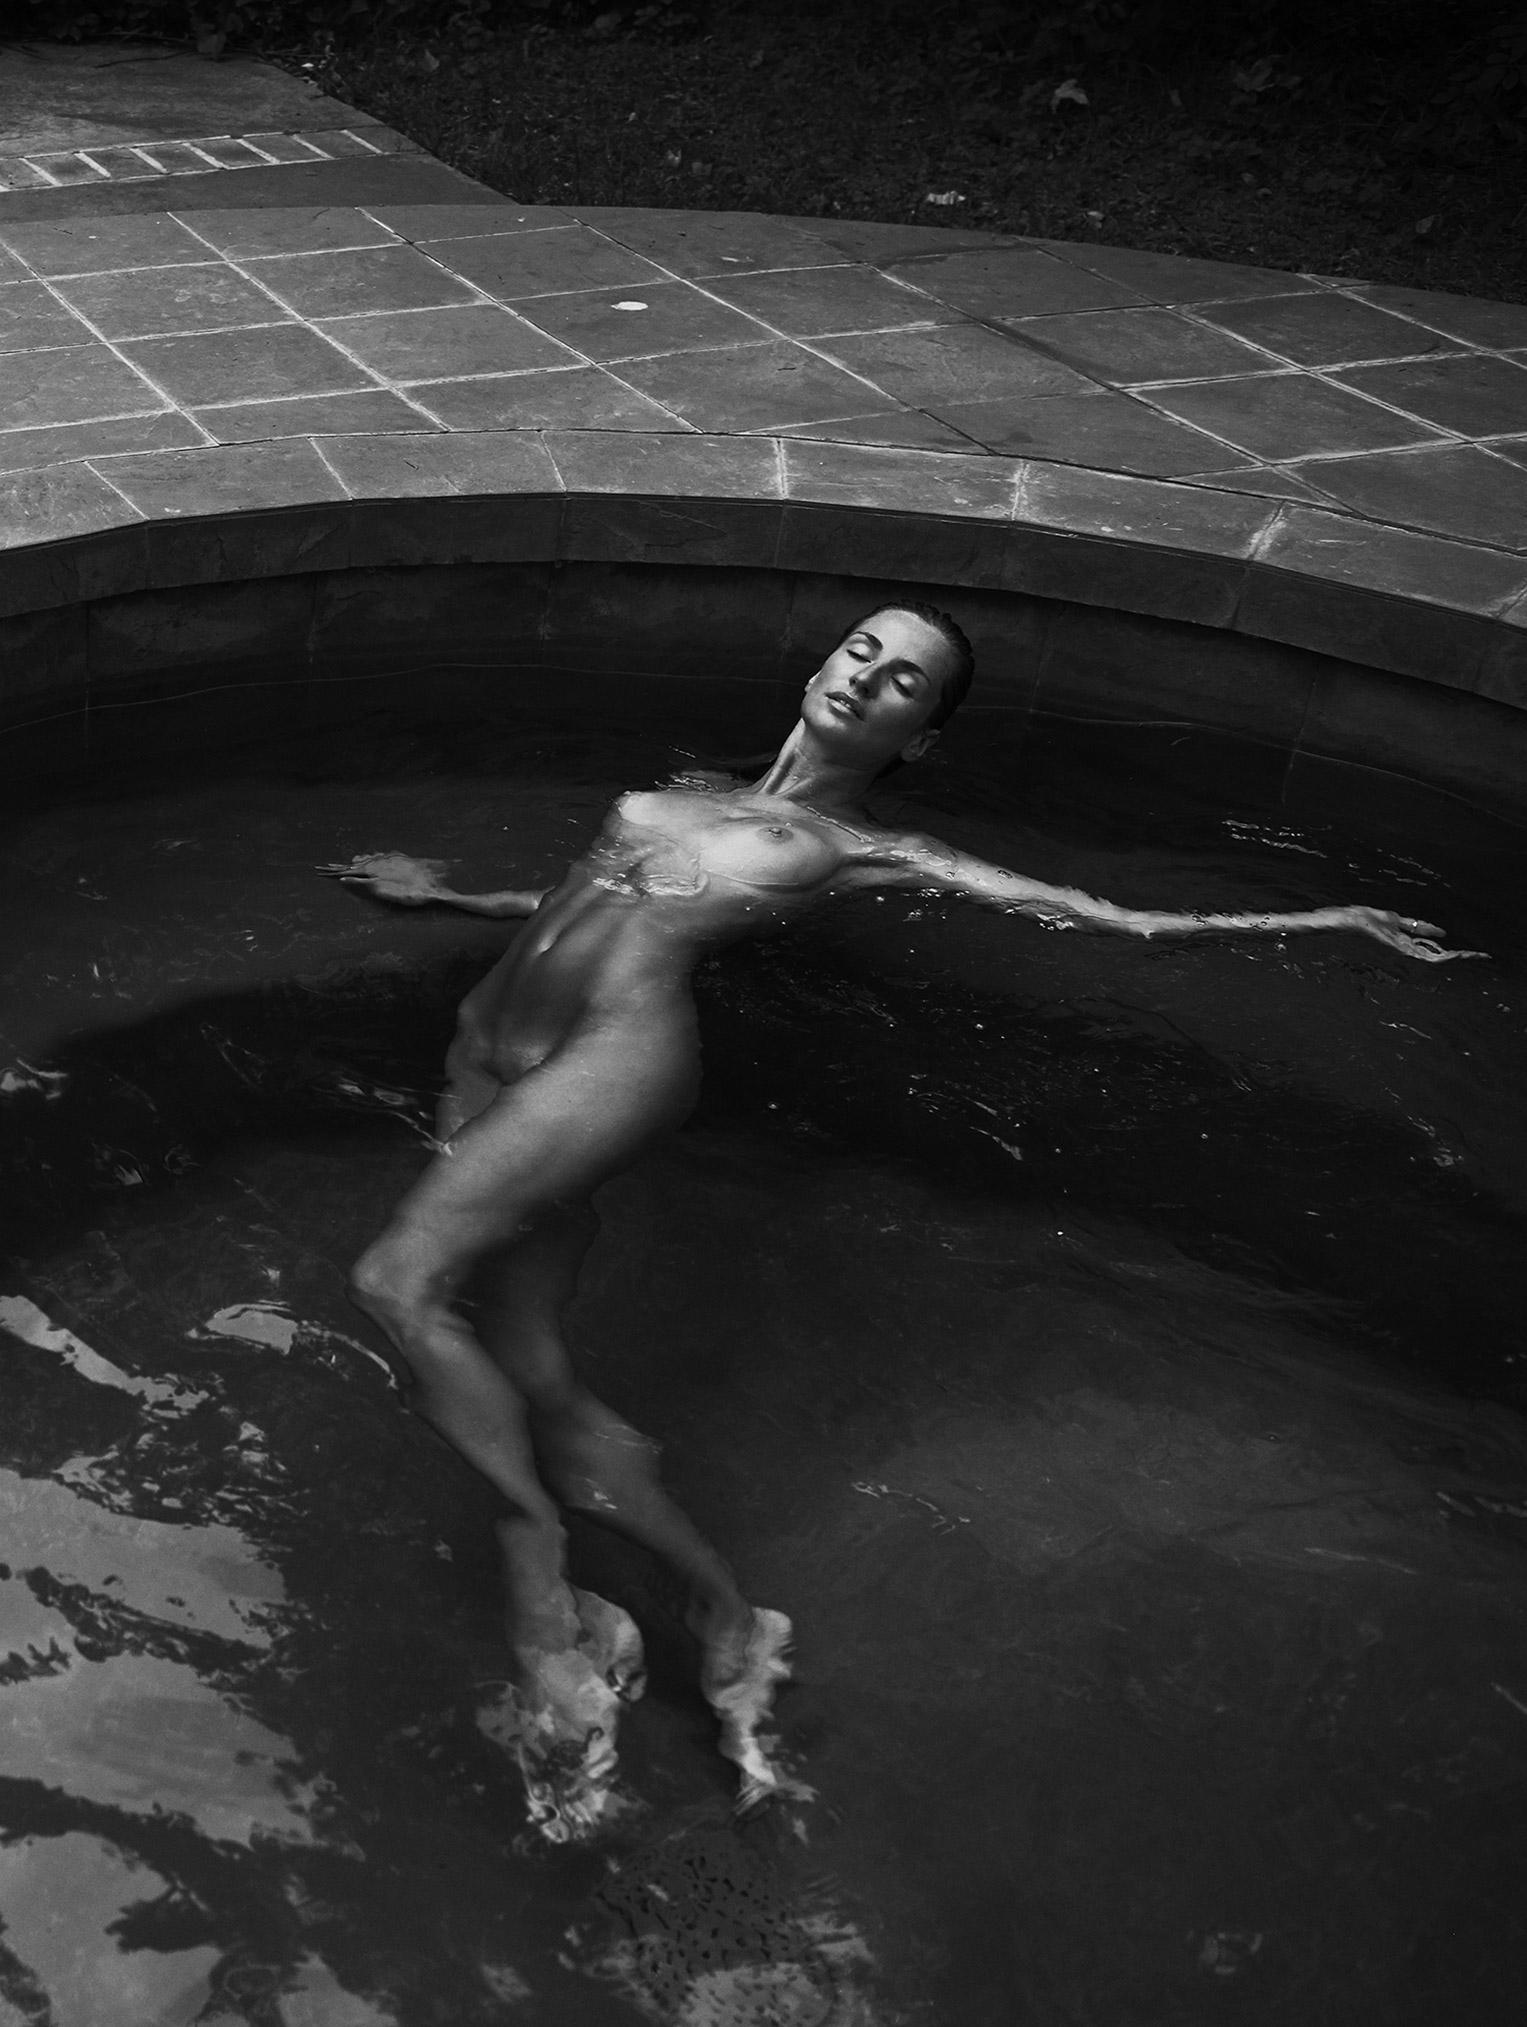 Элен Дали отдыхает у бассейна / Elen Dali nude by Stefan Rappo